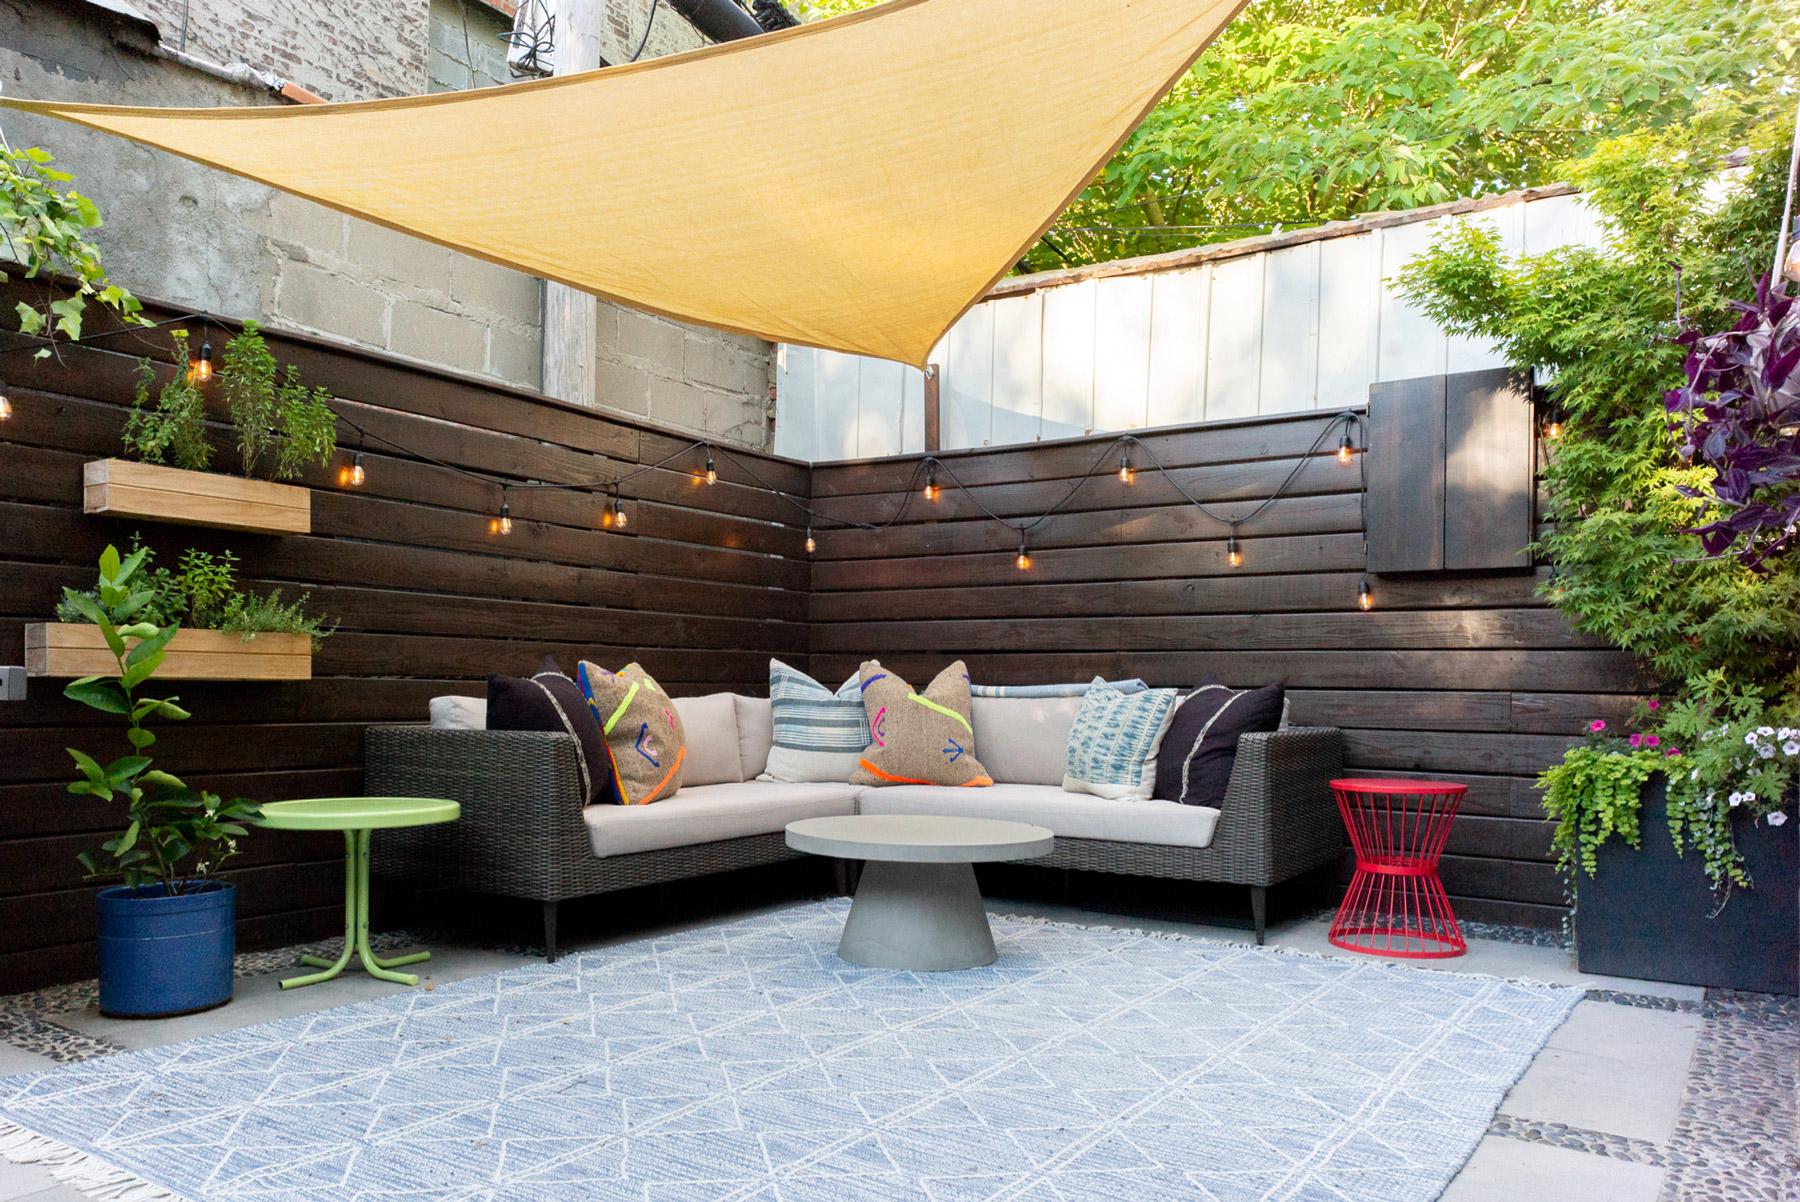 private-city-backyard-patio-living-space.jpg